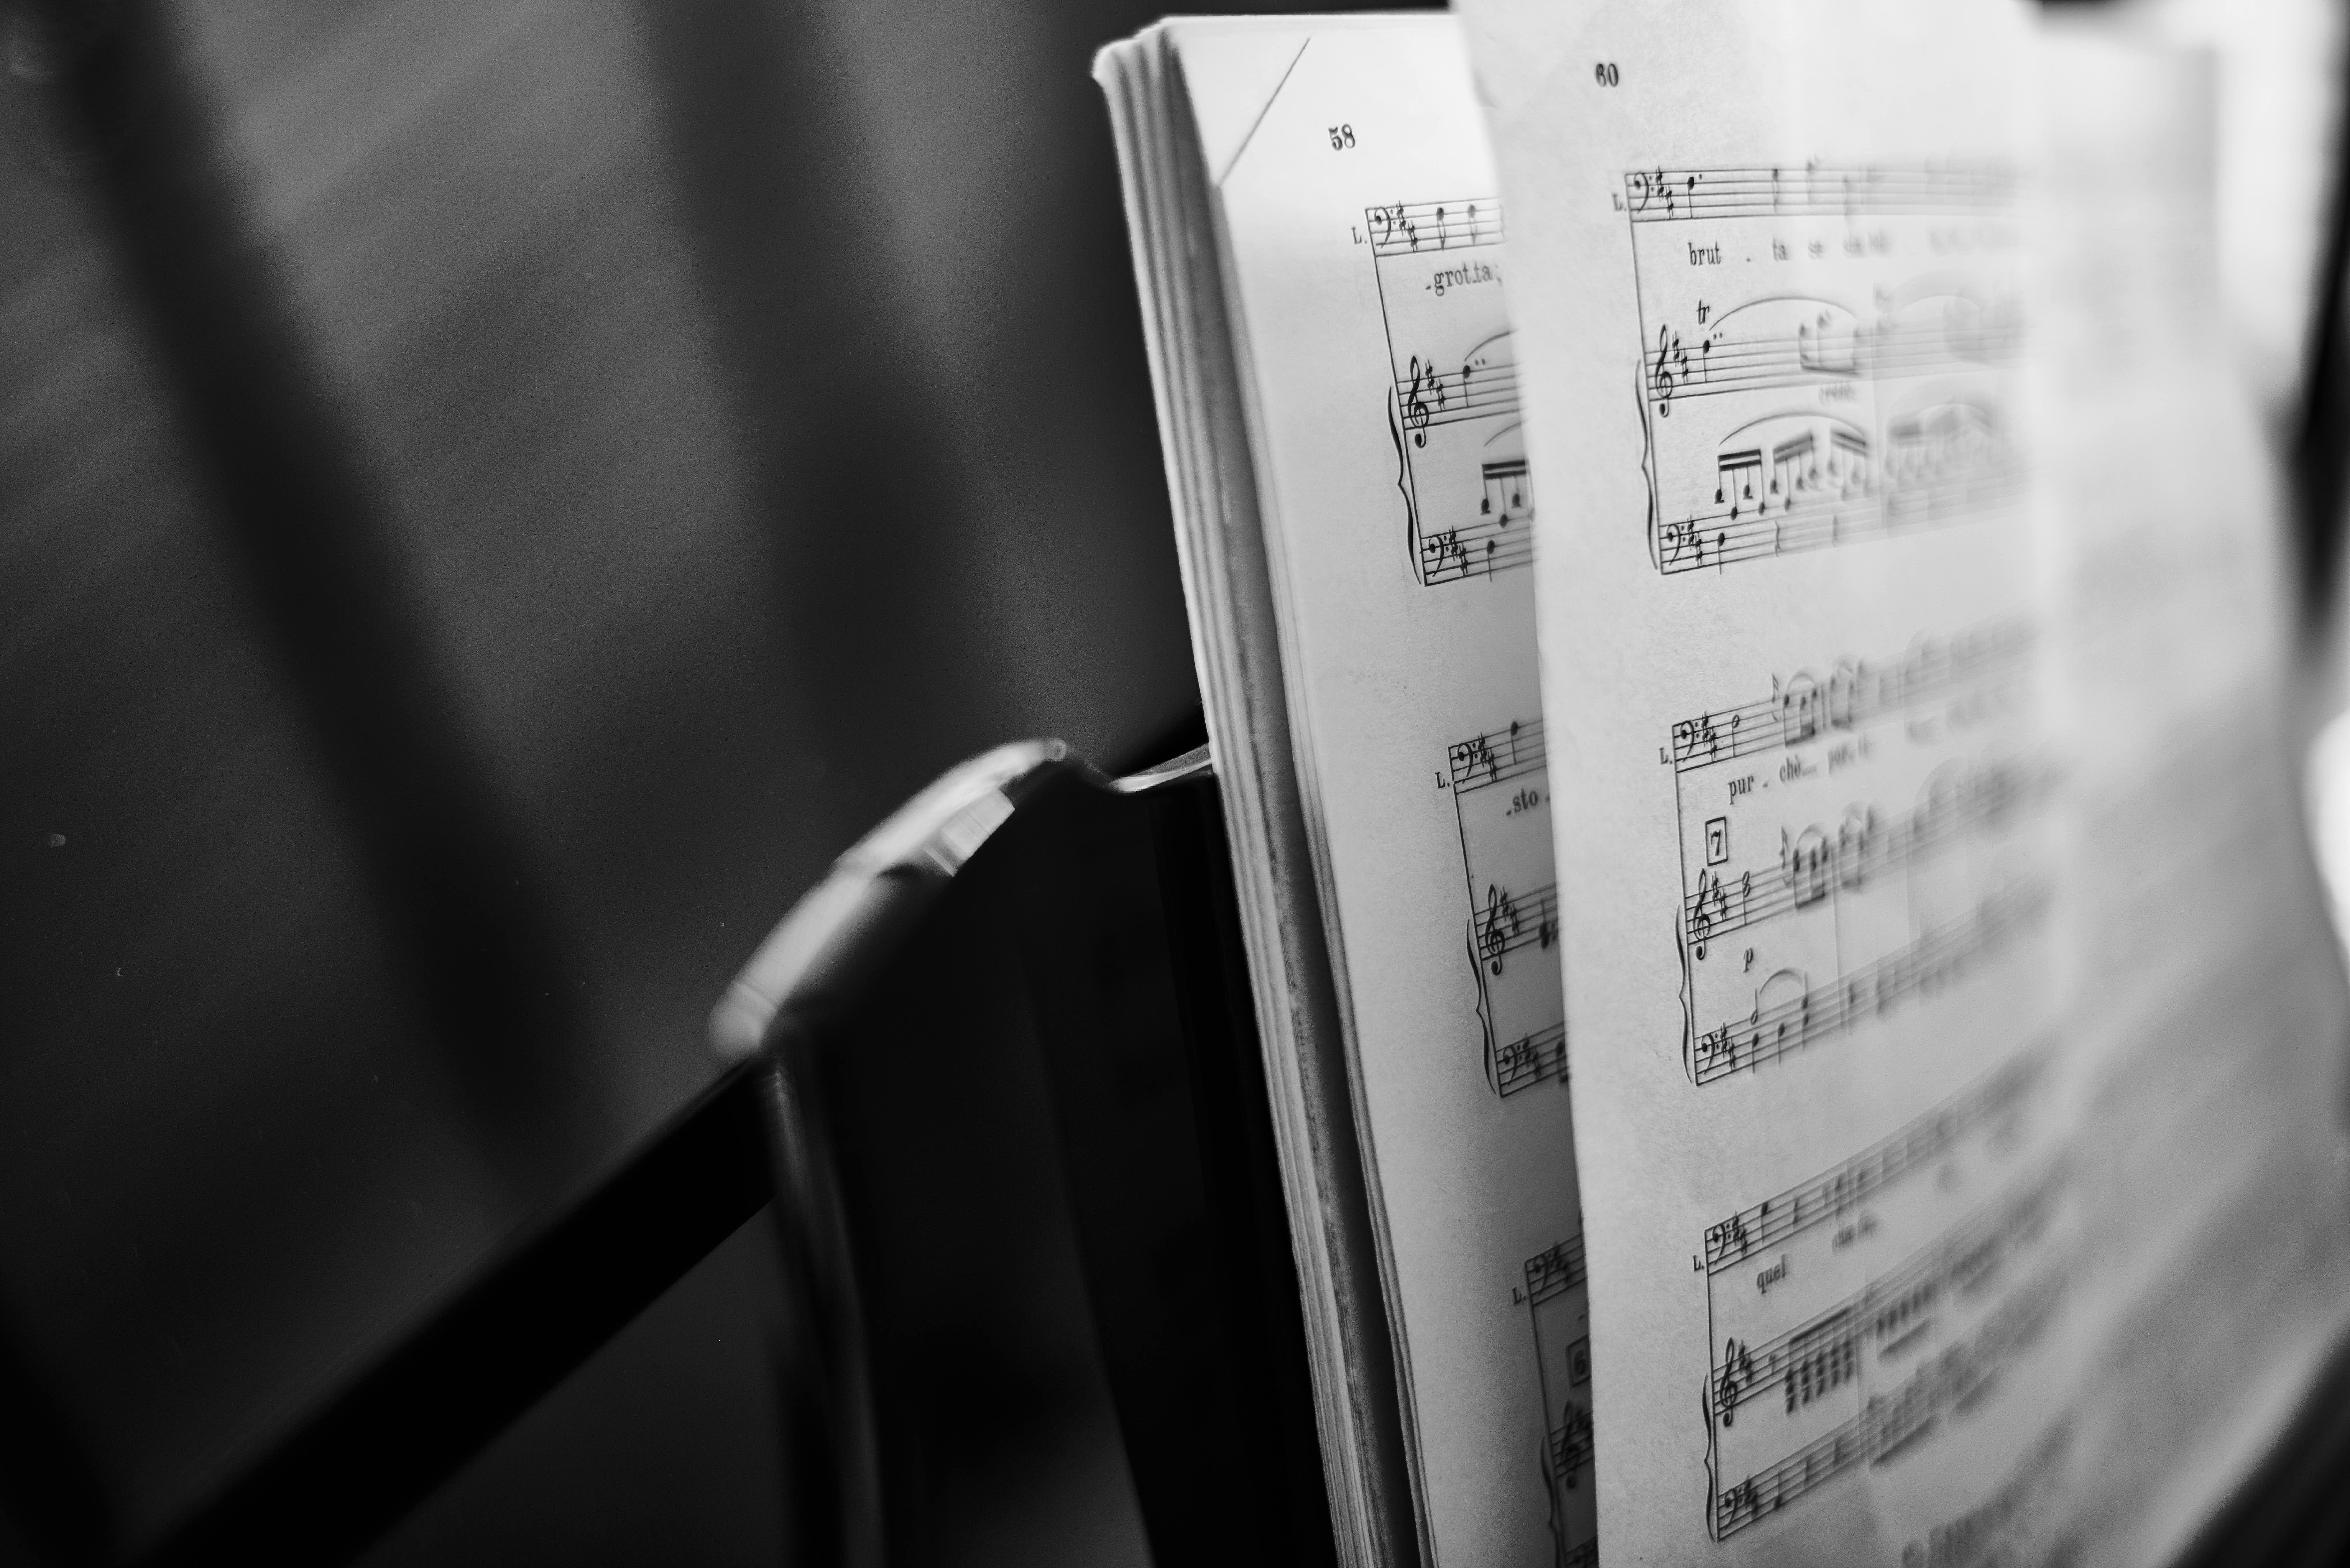 Black and white music score